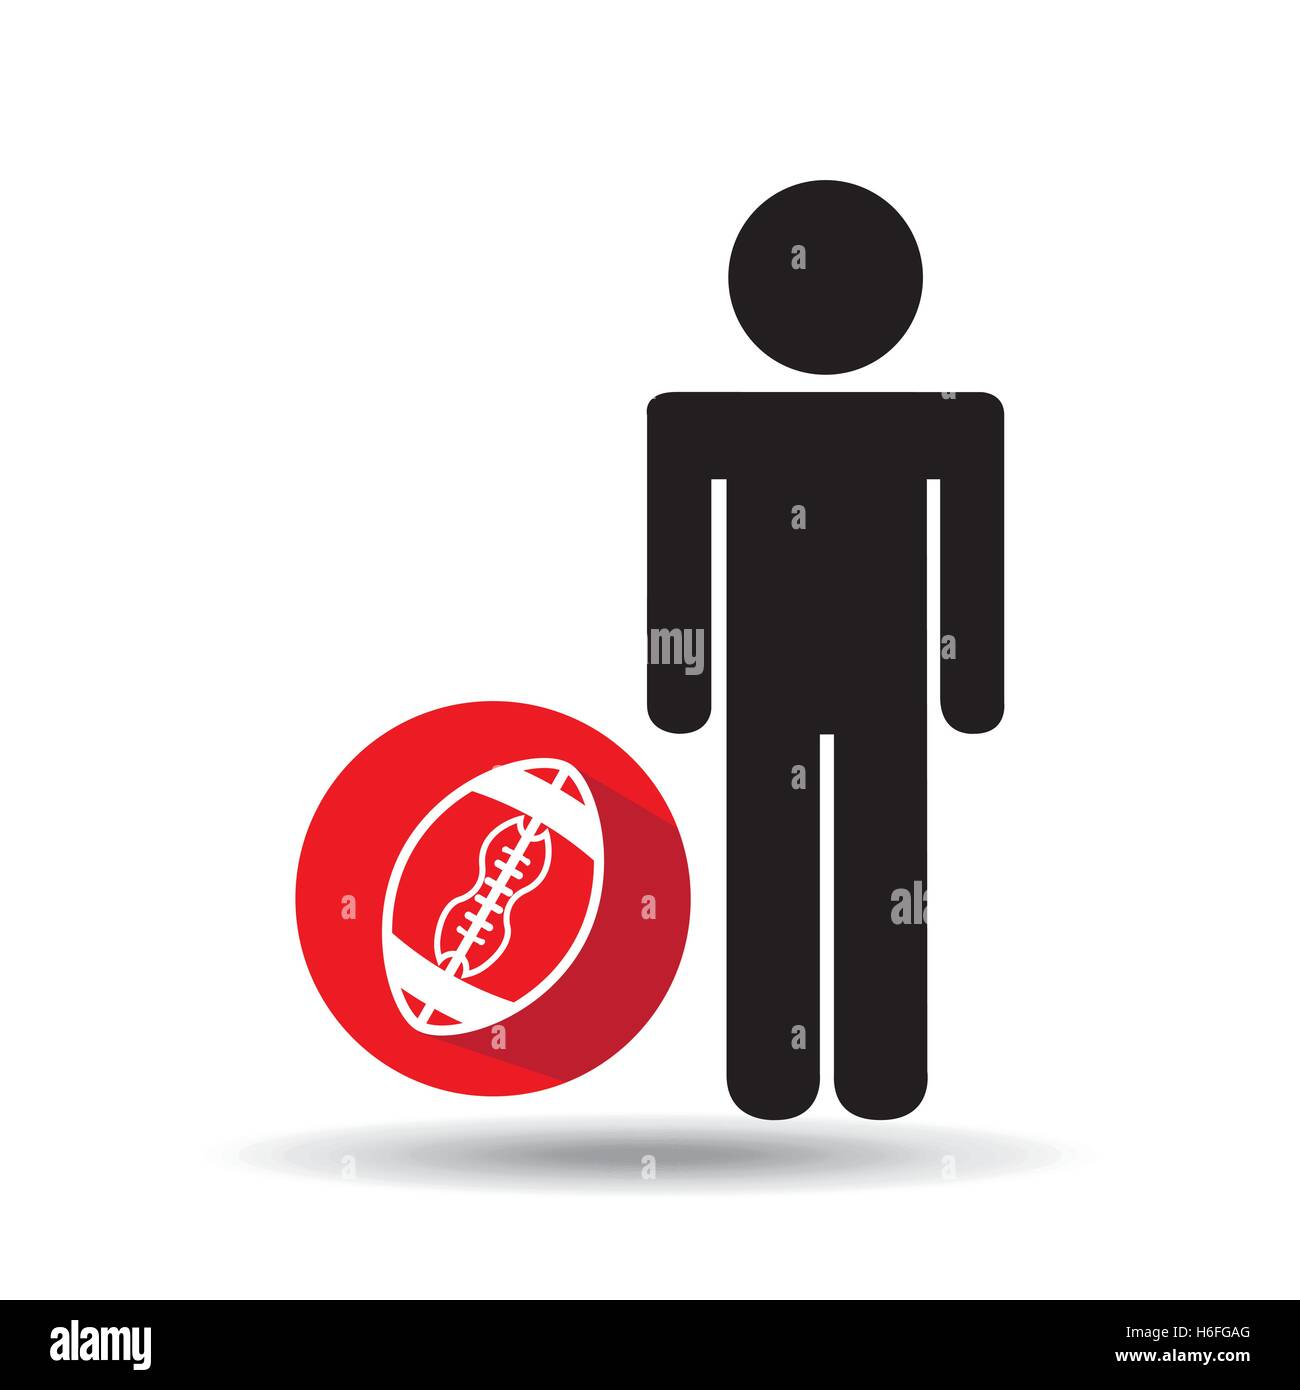 man silhouette football design vector illustration eps 10 - Stock Image